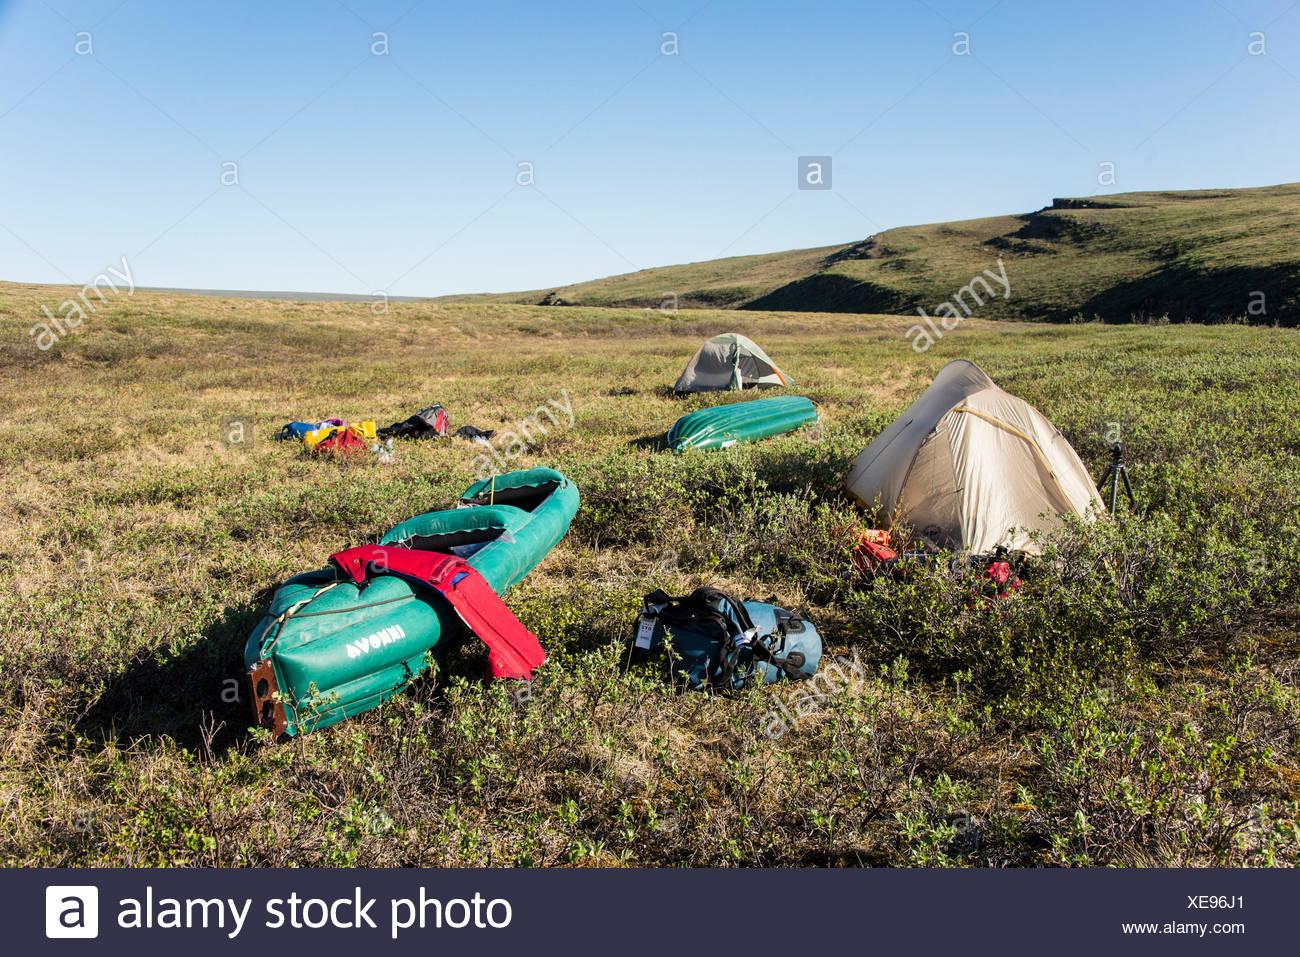 Camping, camping, expedición, reserva nacional del petróleo, la reserva de petróleo, Alaska, EE.UU., América, reserva, Alaska, EE.UU., Améric Imagen De Stock